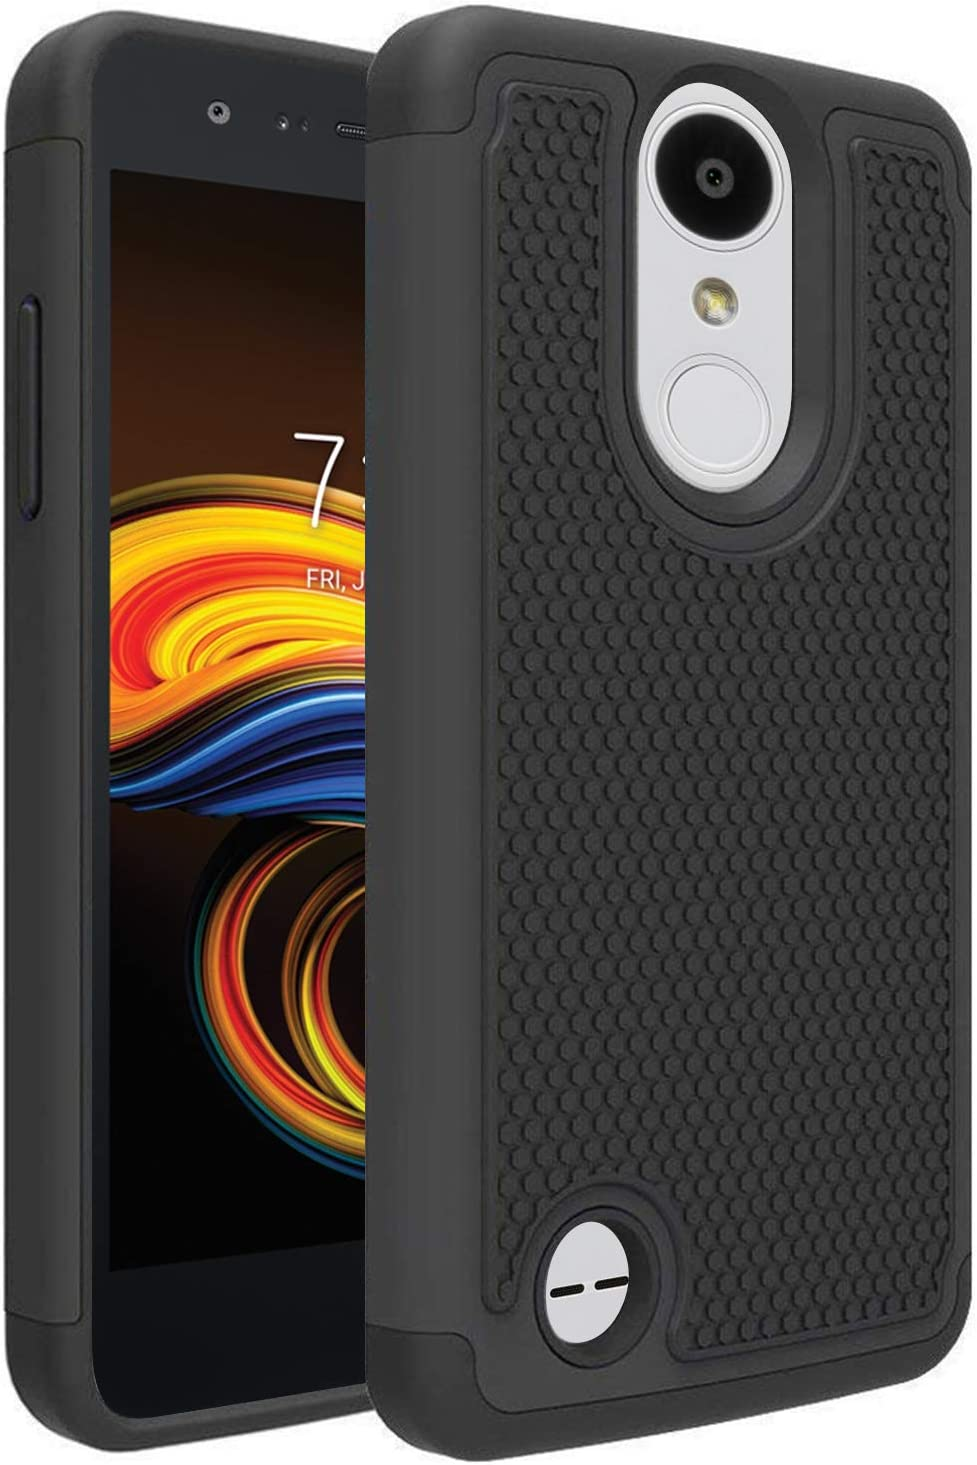 LG Aristo 3/LG Aristo 2/LG Tribute Empire/K8S/Tribute Dynasty/Phoenix 4/Rebel 4/Zone 4/Rebel 3 LTE/Risio 3/LG K8+ Plus/Phoenix 3/Fortune 2 Phone Case, OEAGO [Shockproof] Hybrid Dual Layer Case, Black